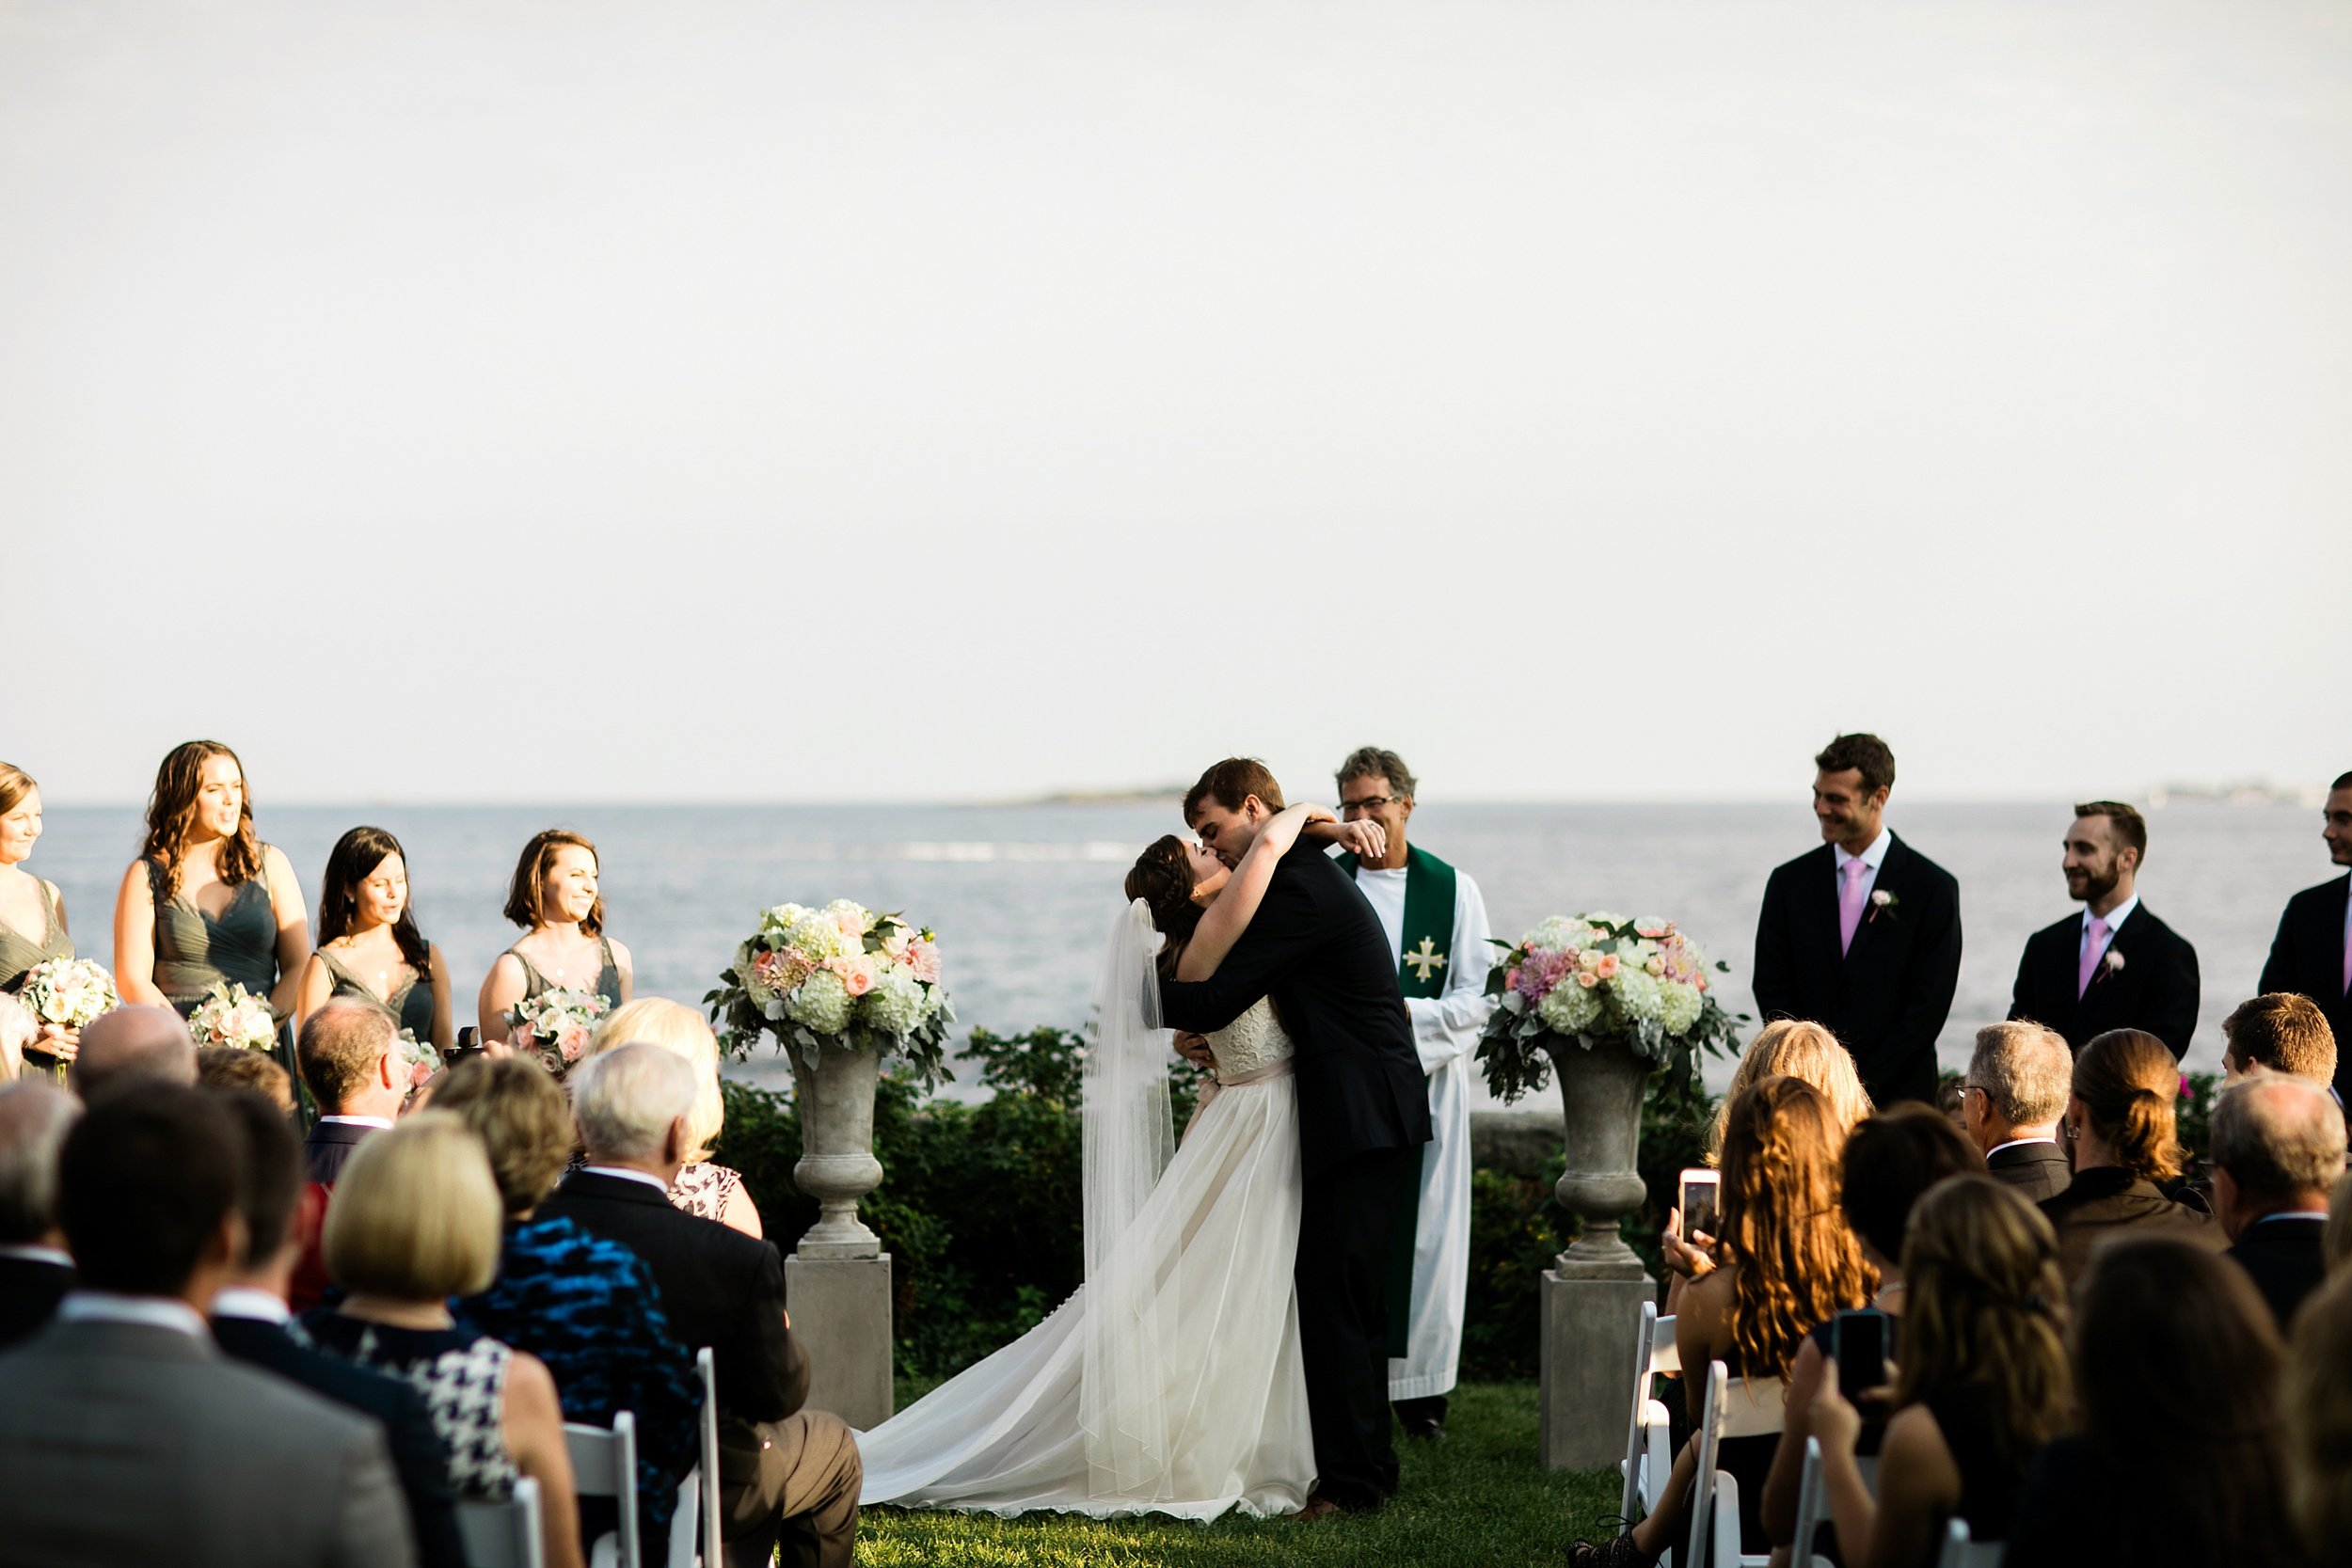 033 los angeles wedding photographer todd danforth photography boston.jpg